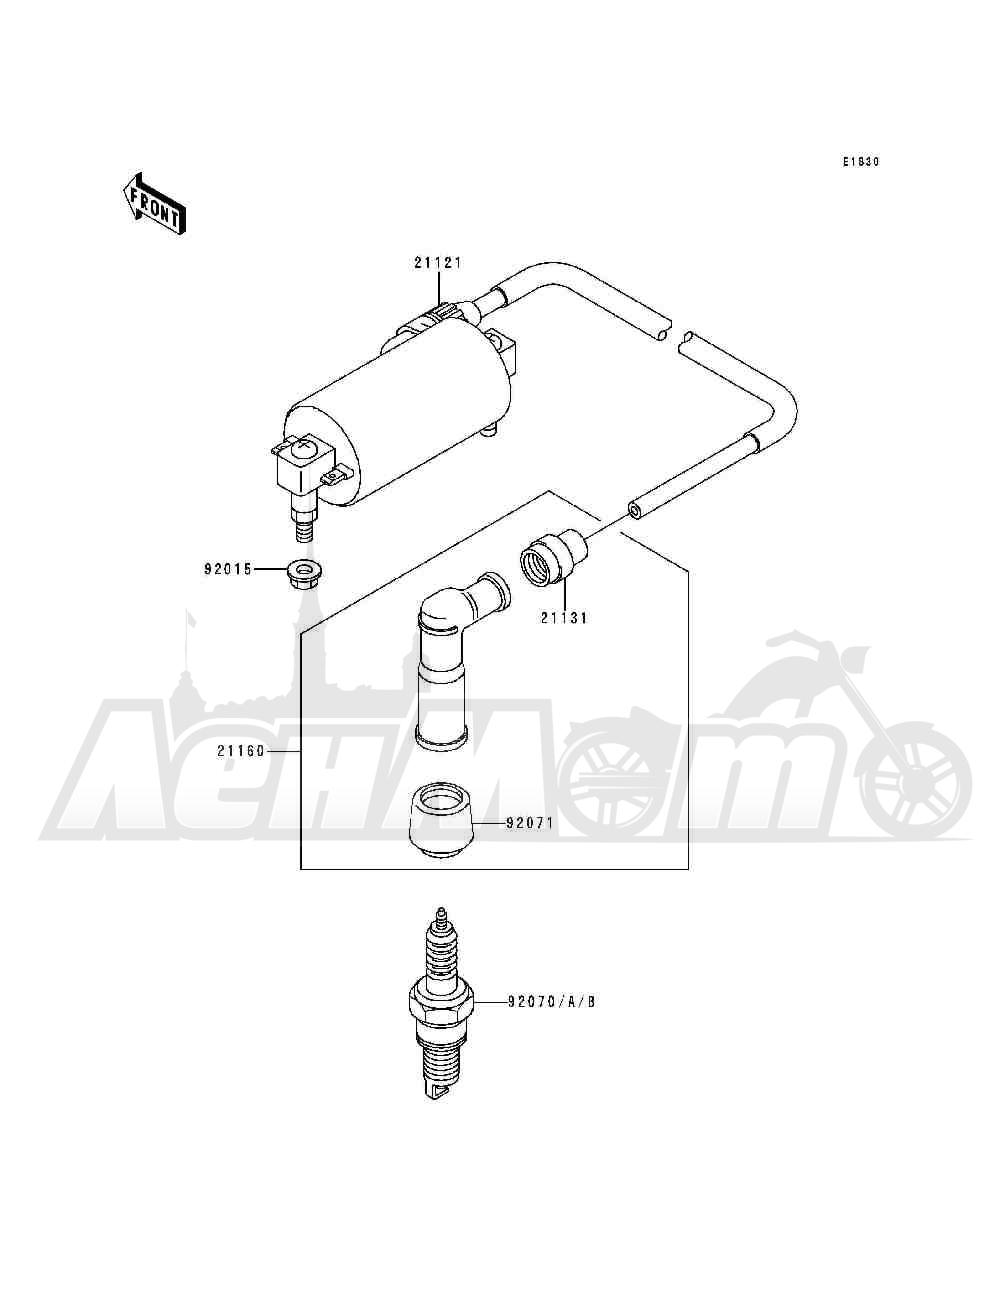 Запчасти для Квадроцикла Kawasaki 1993 BAYOU 300 (KLF300-B6) Раздел: IGNITION SYSTEM | система зажигания